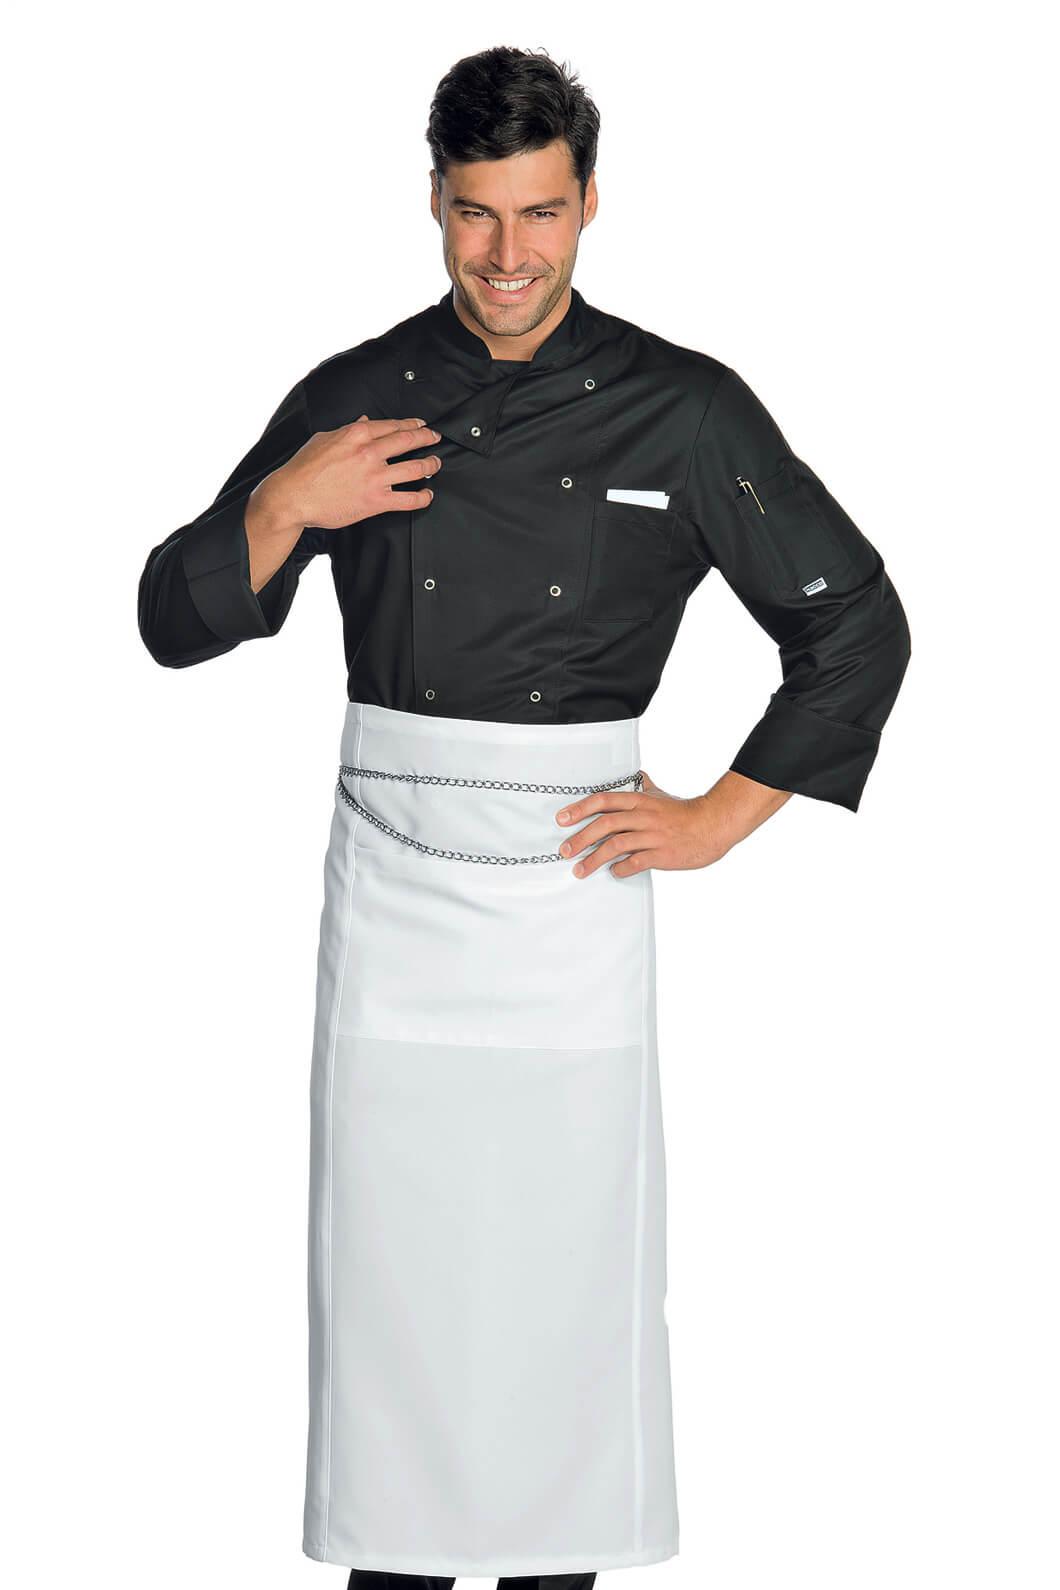 Veste chef cuisinier noir microfibres for Cuisinier particulier